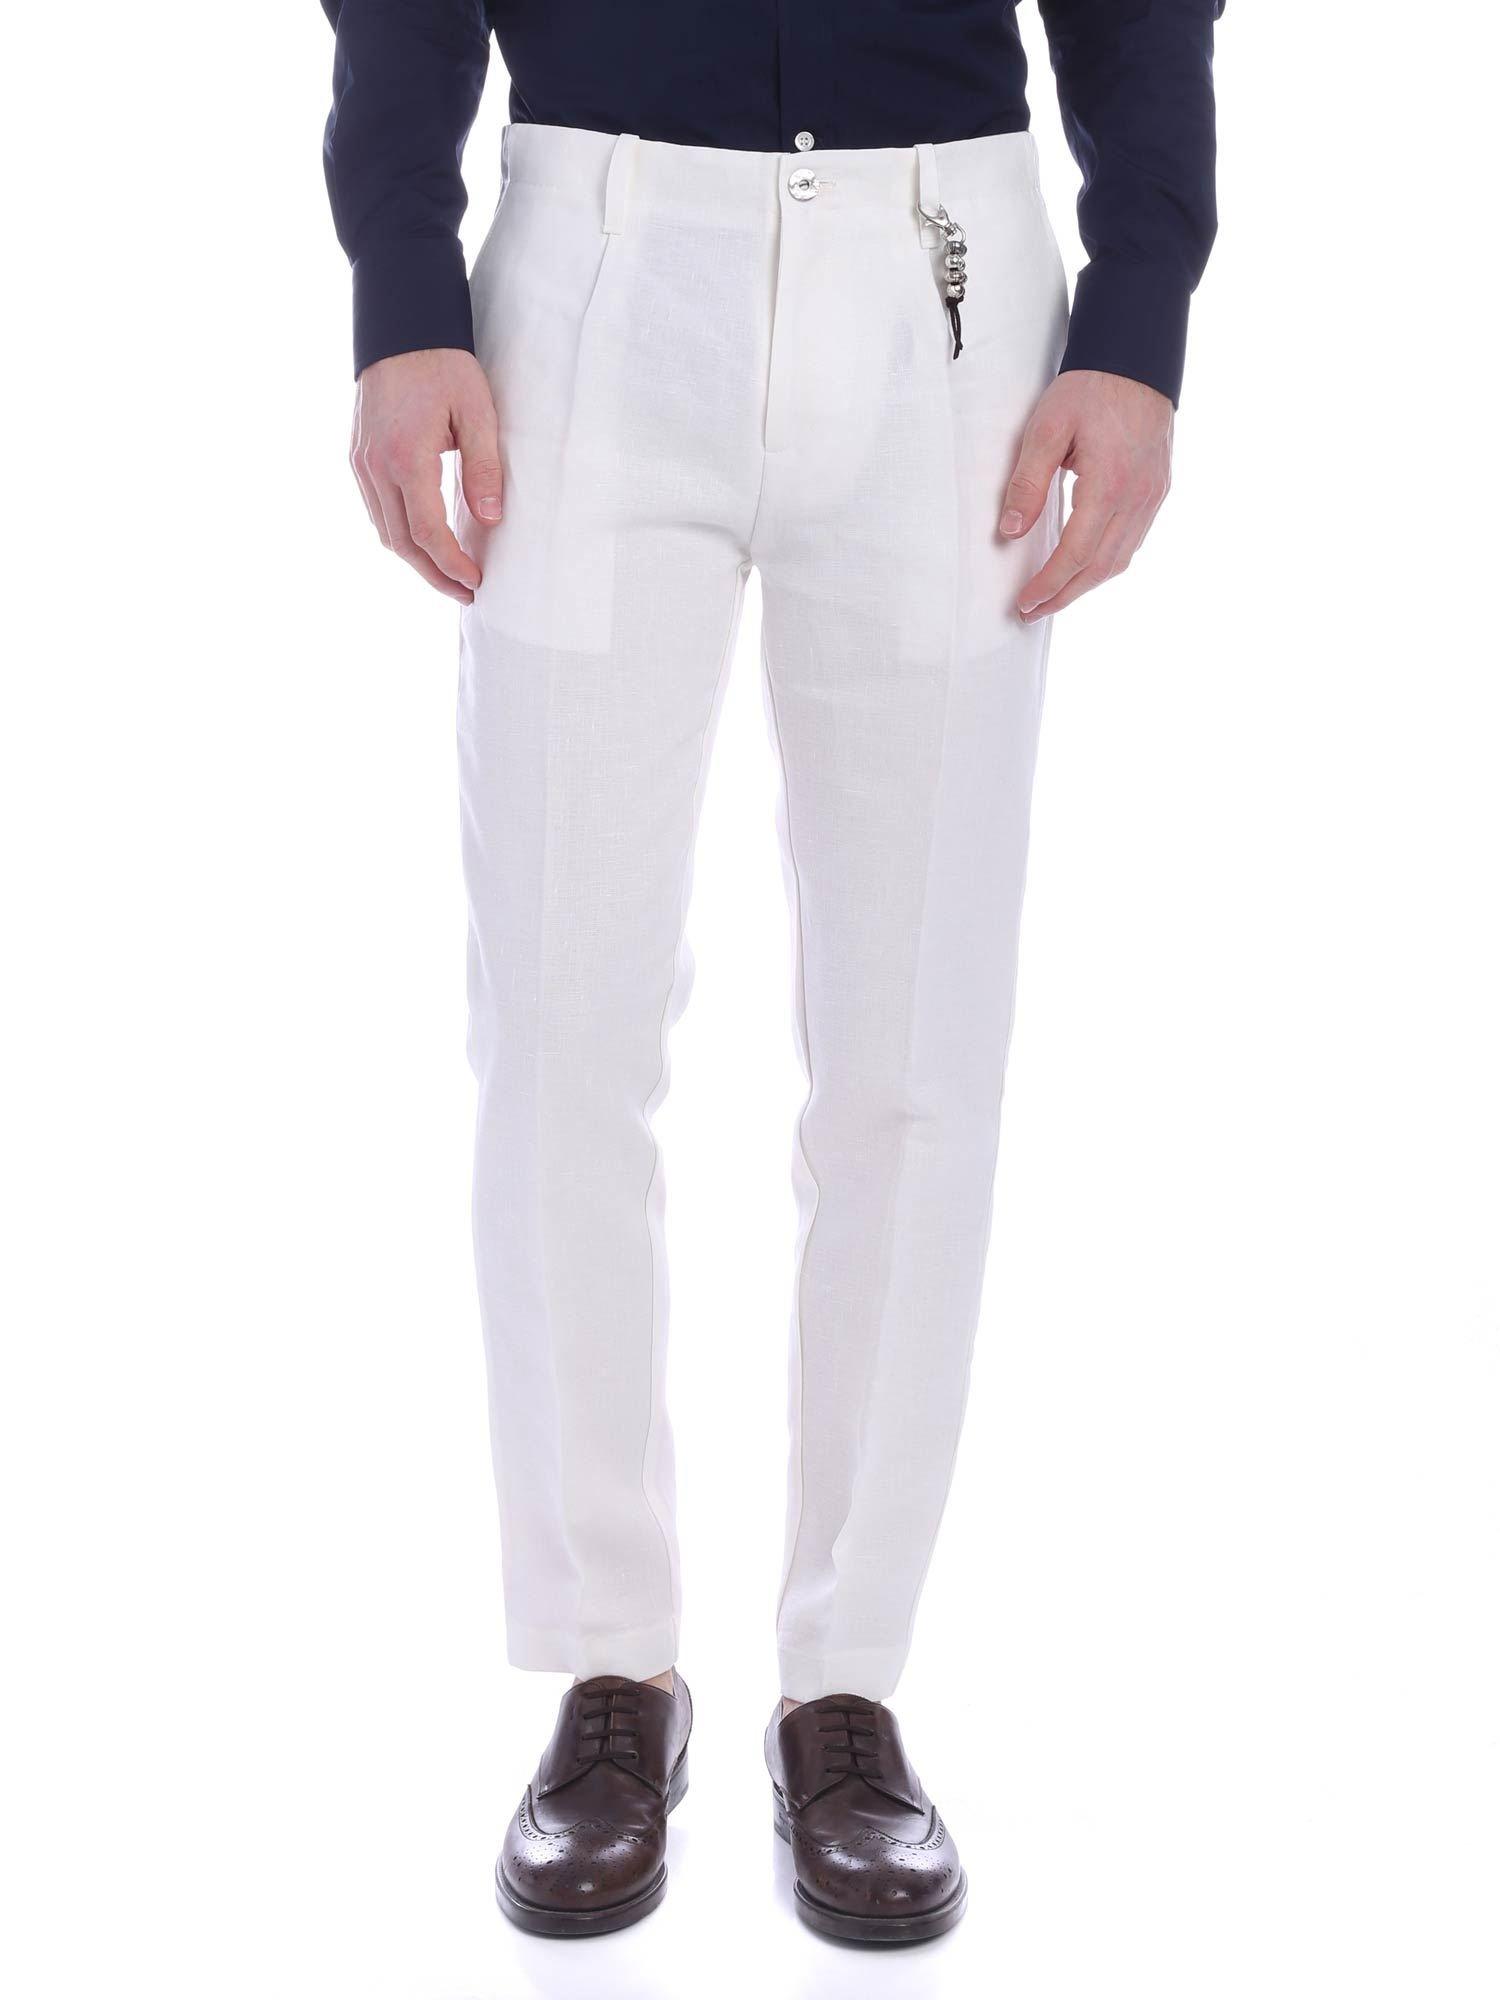 Image of Pantalone una pence lino bianco R92 L-B